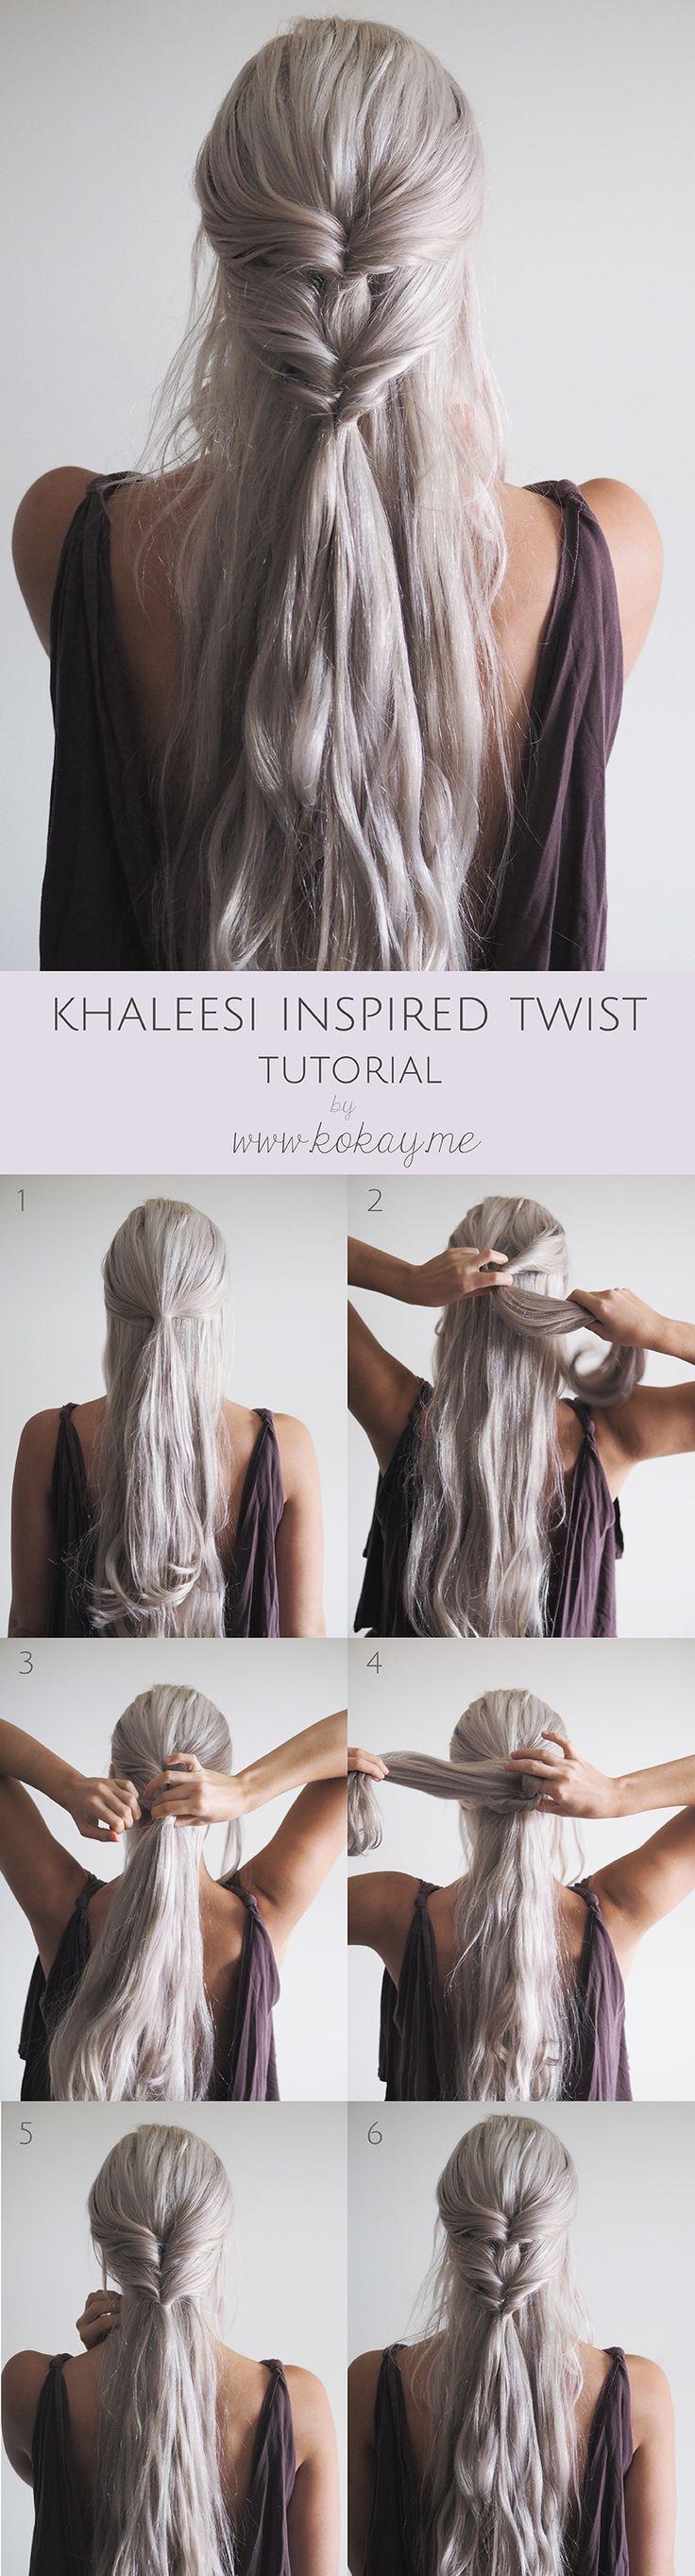 Half up half down wedding hairstyles khaleesi hair inspo and